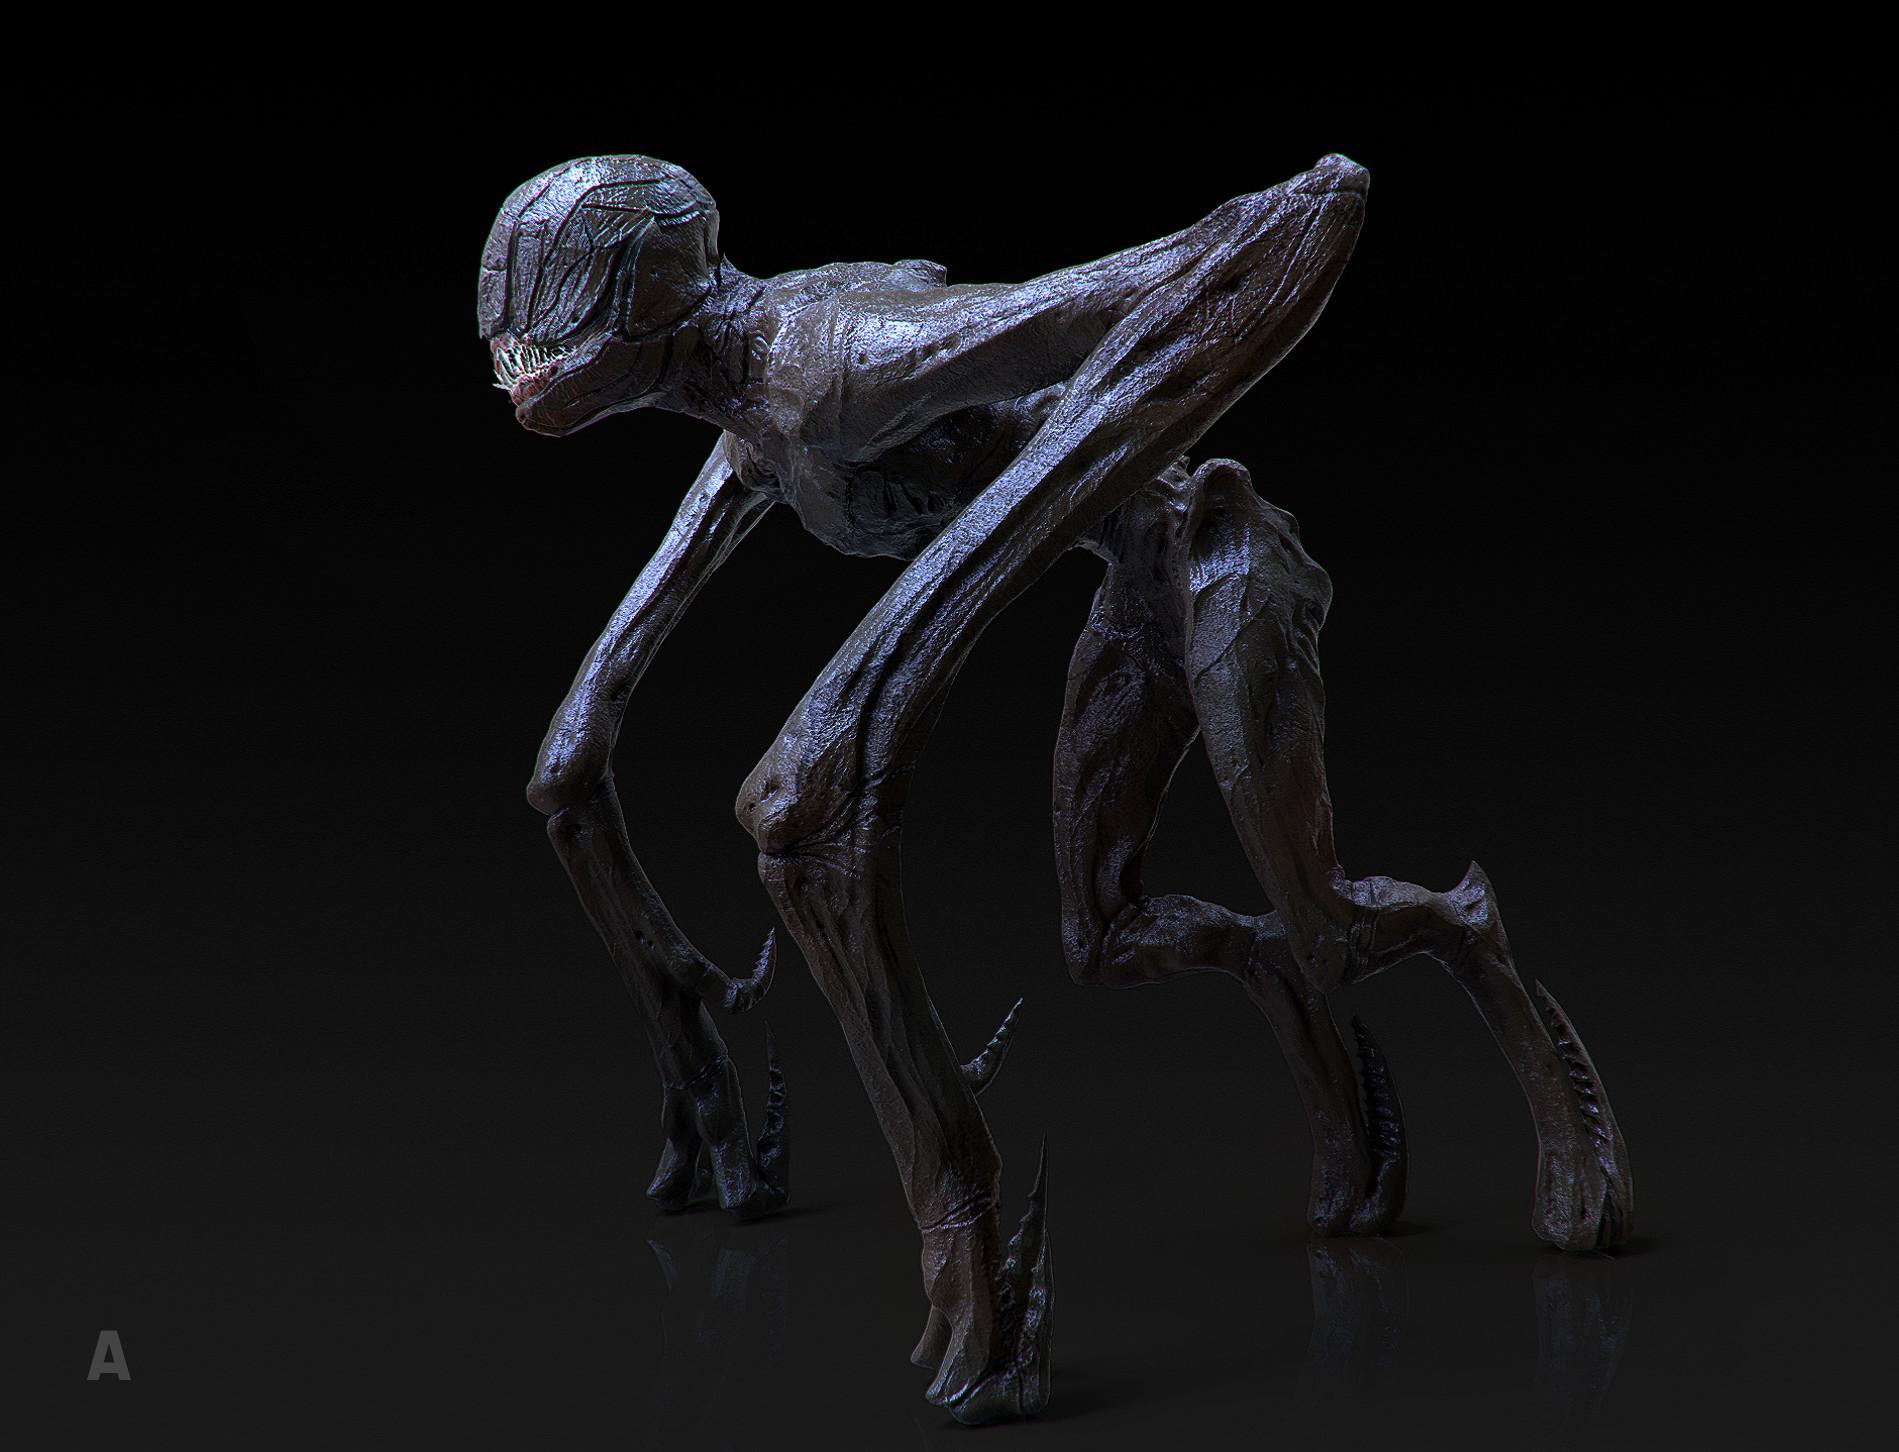 Luis carrasco quietplace creature lc 6a 01